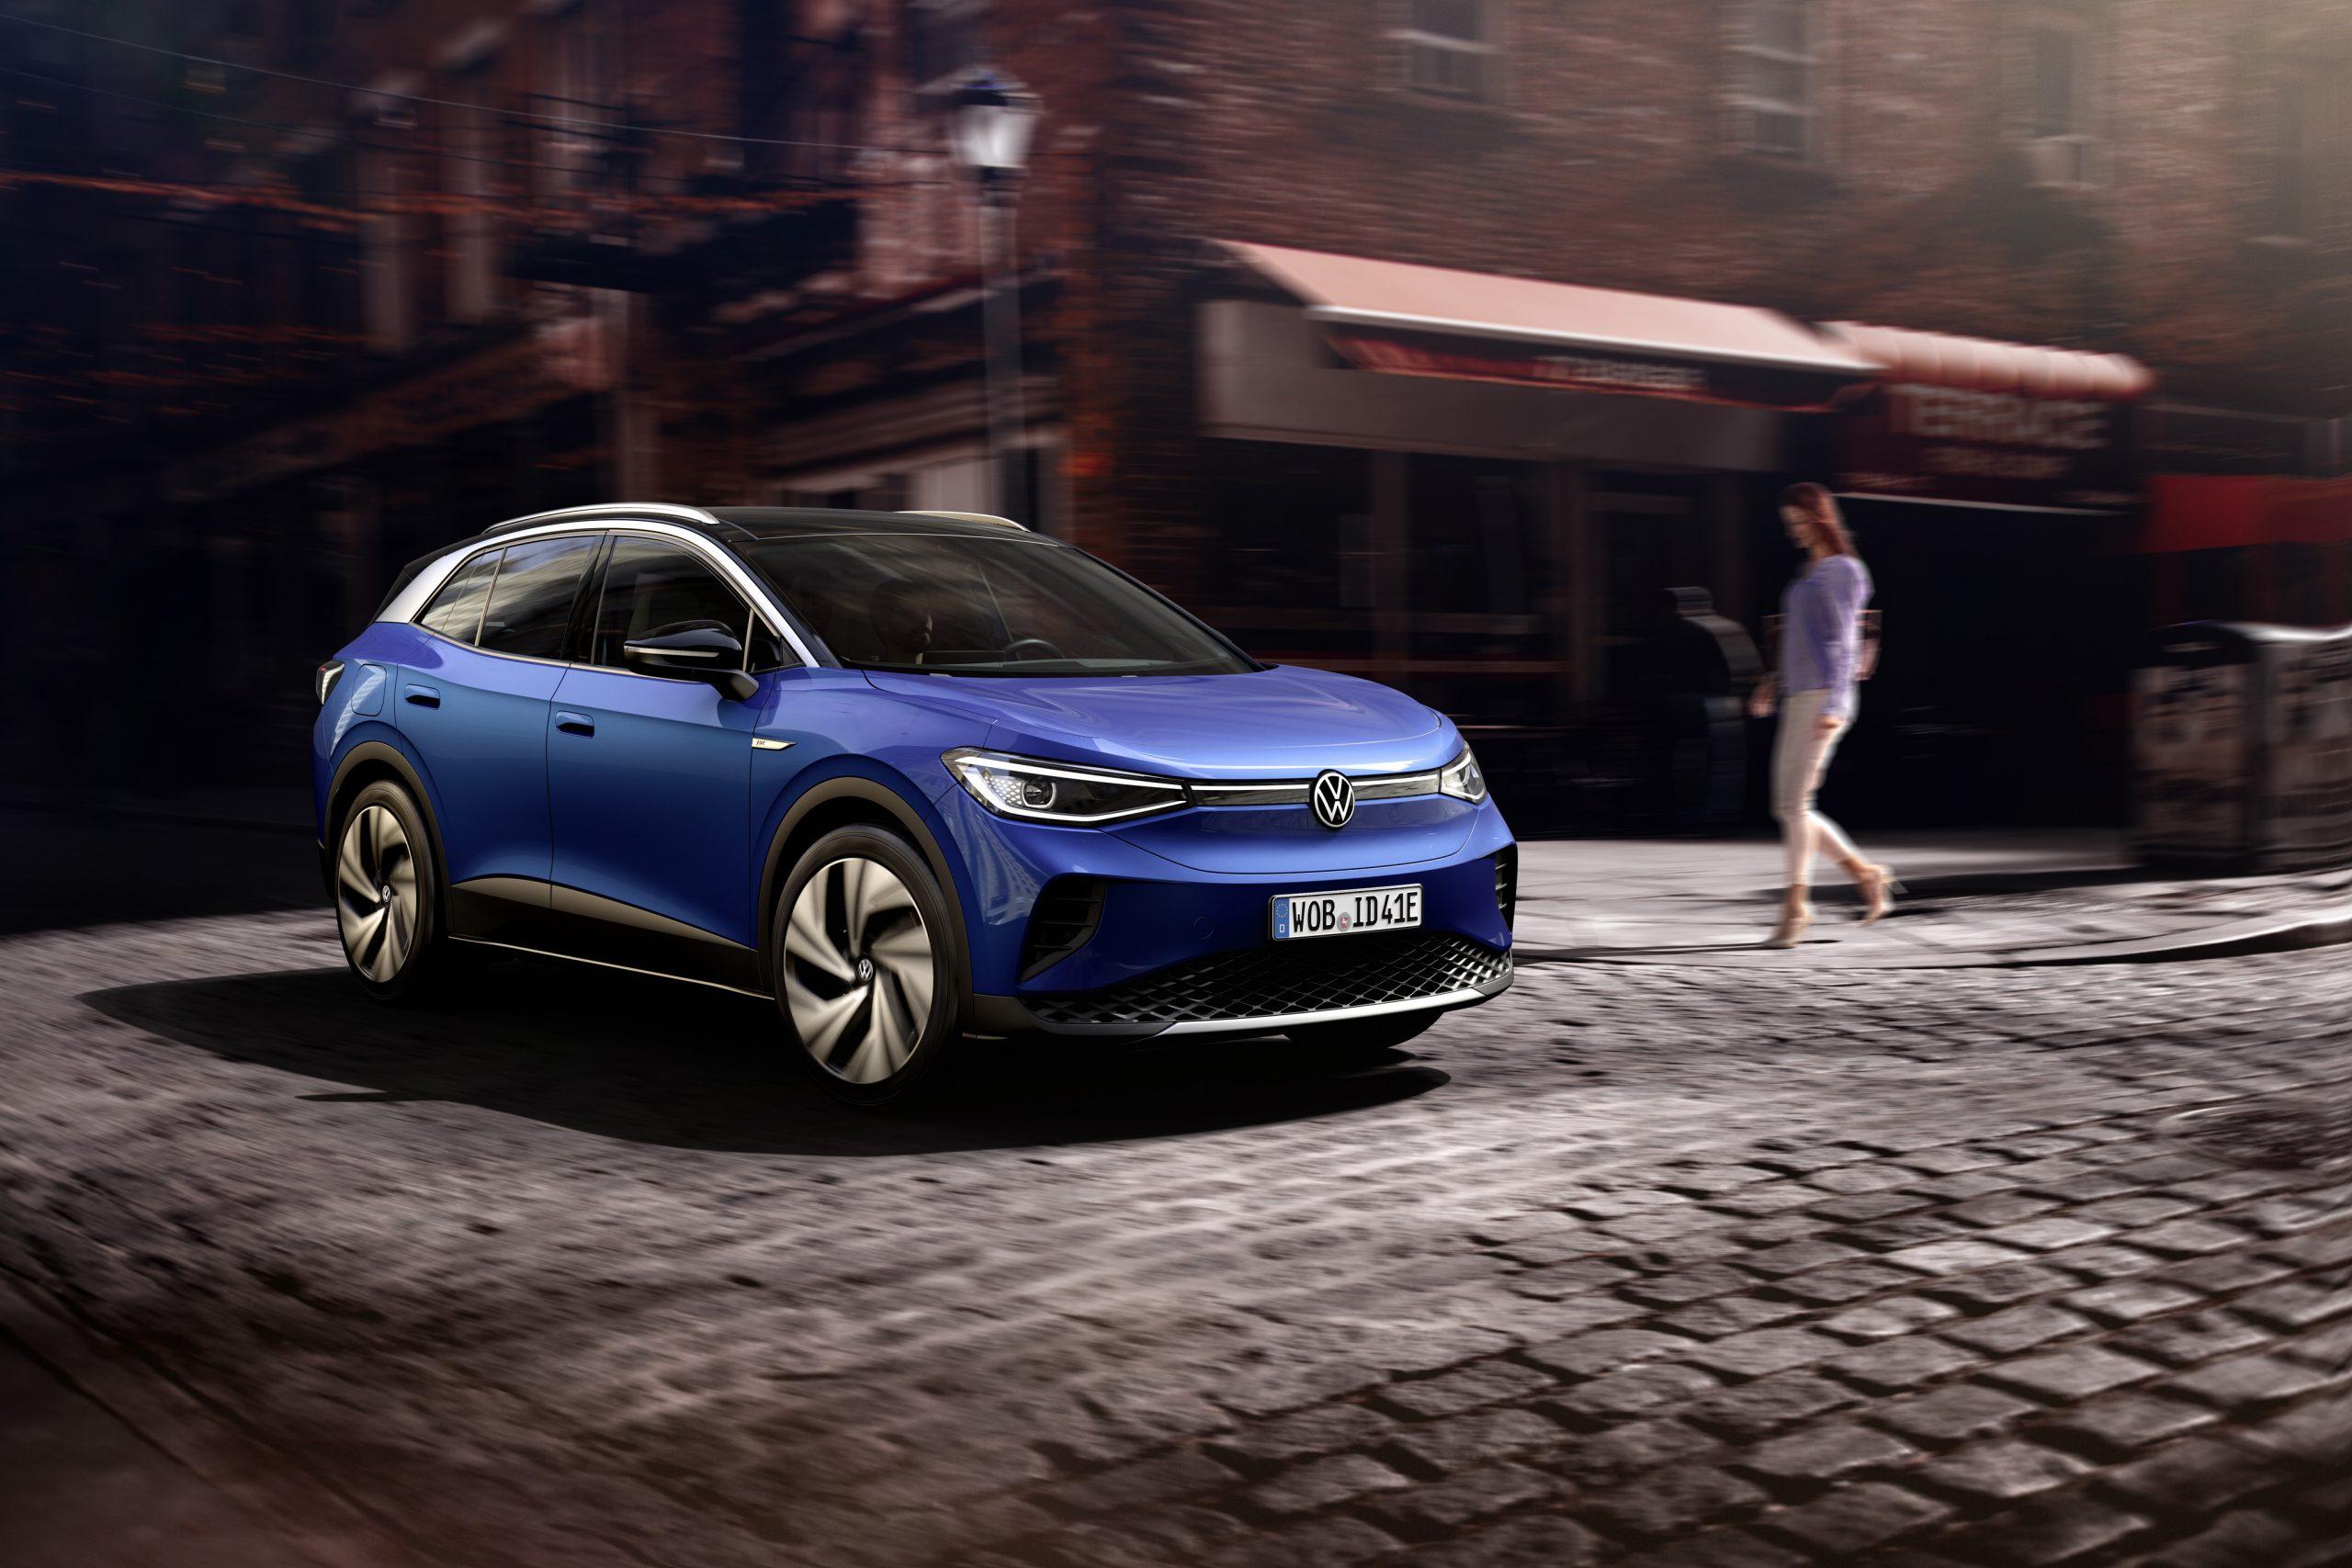 2021 VW ID4 front three quarter